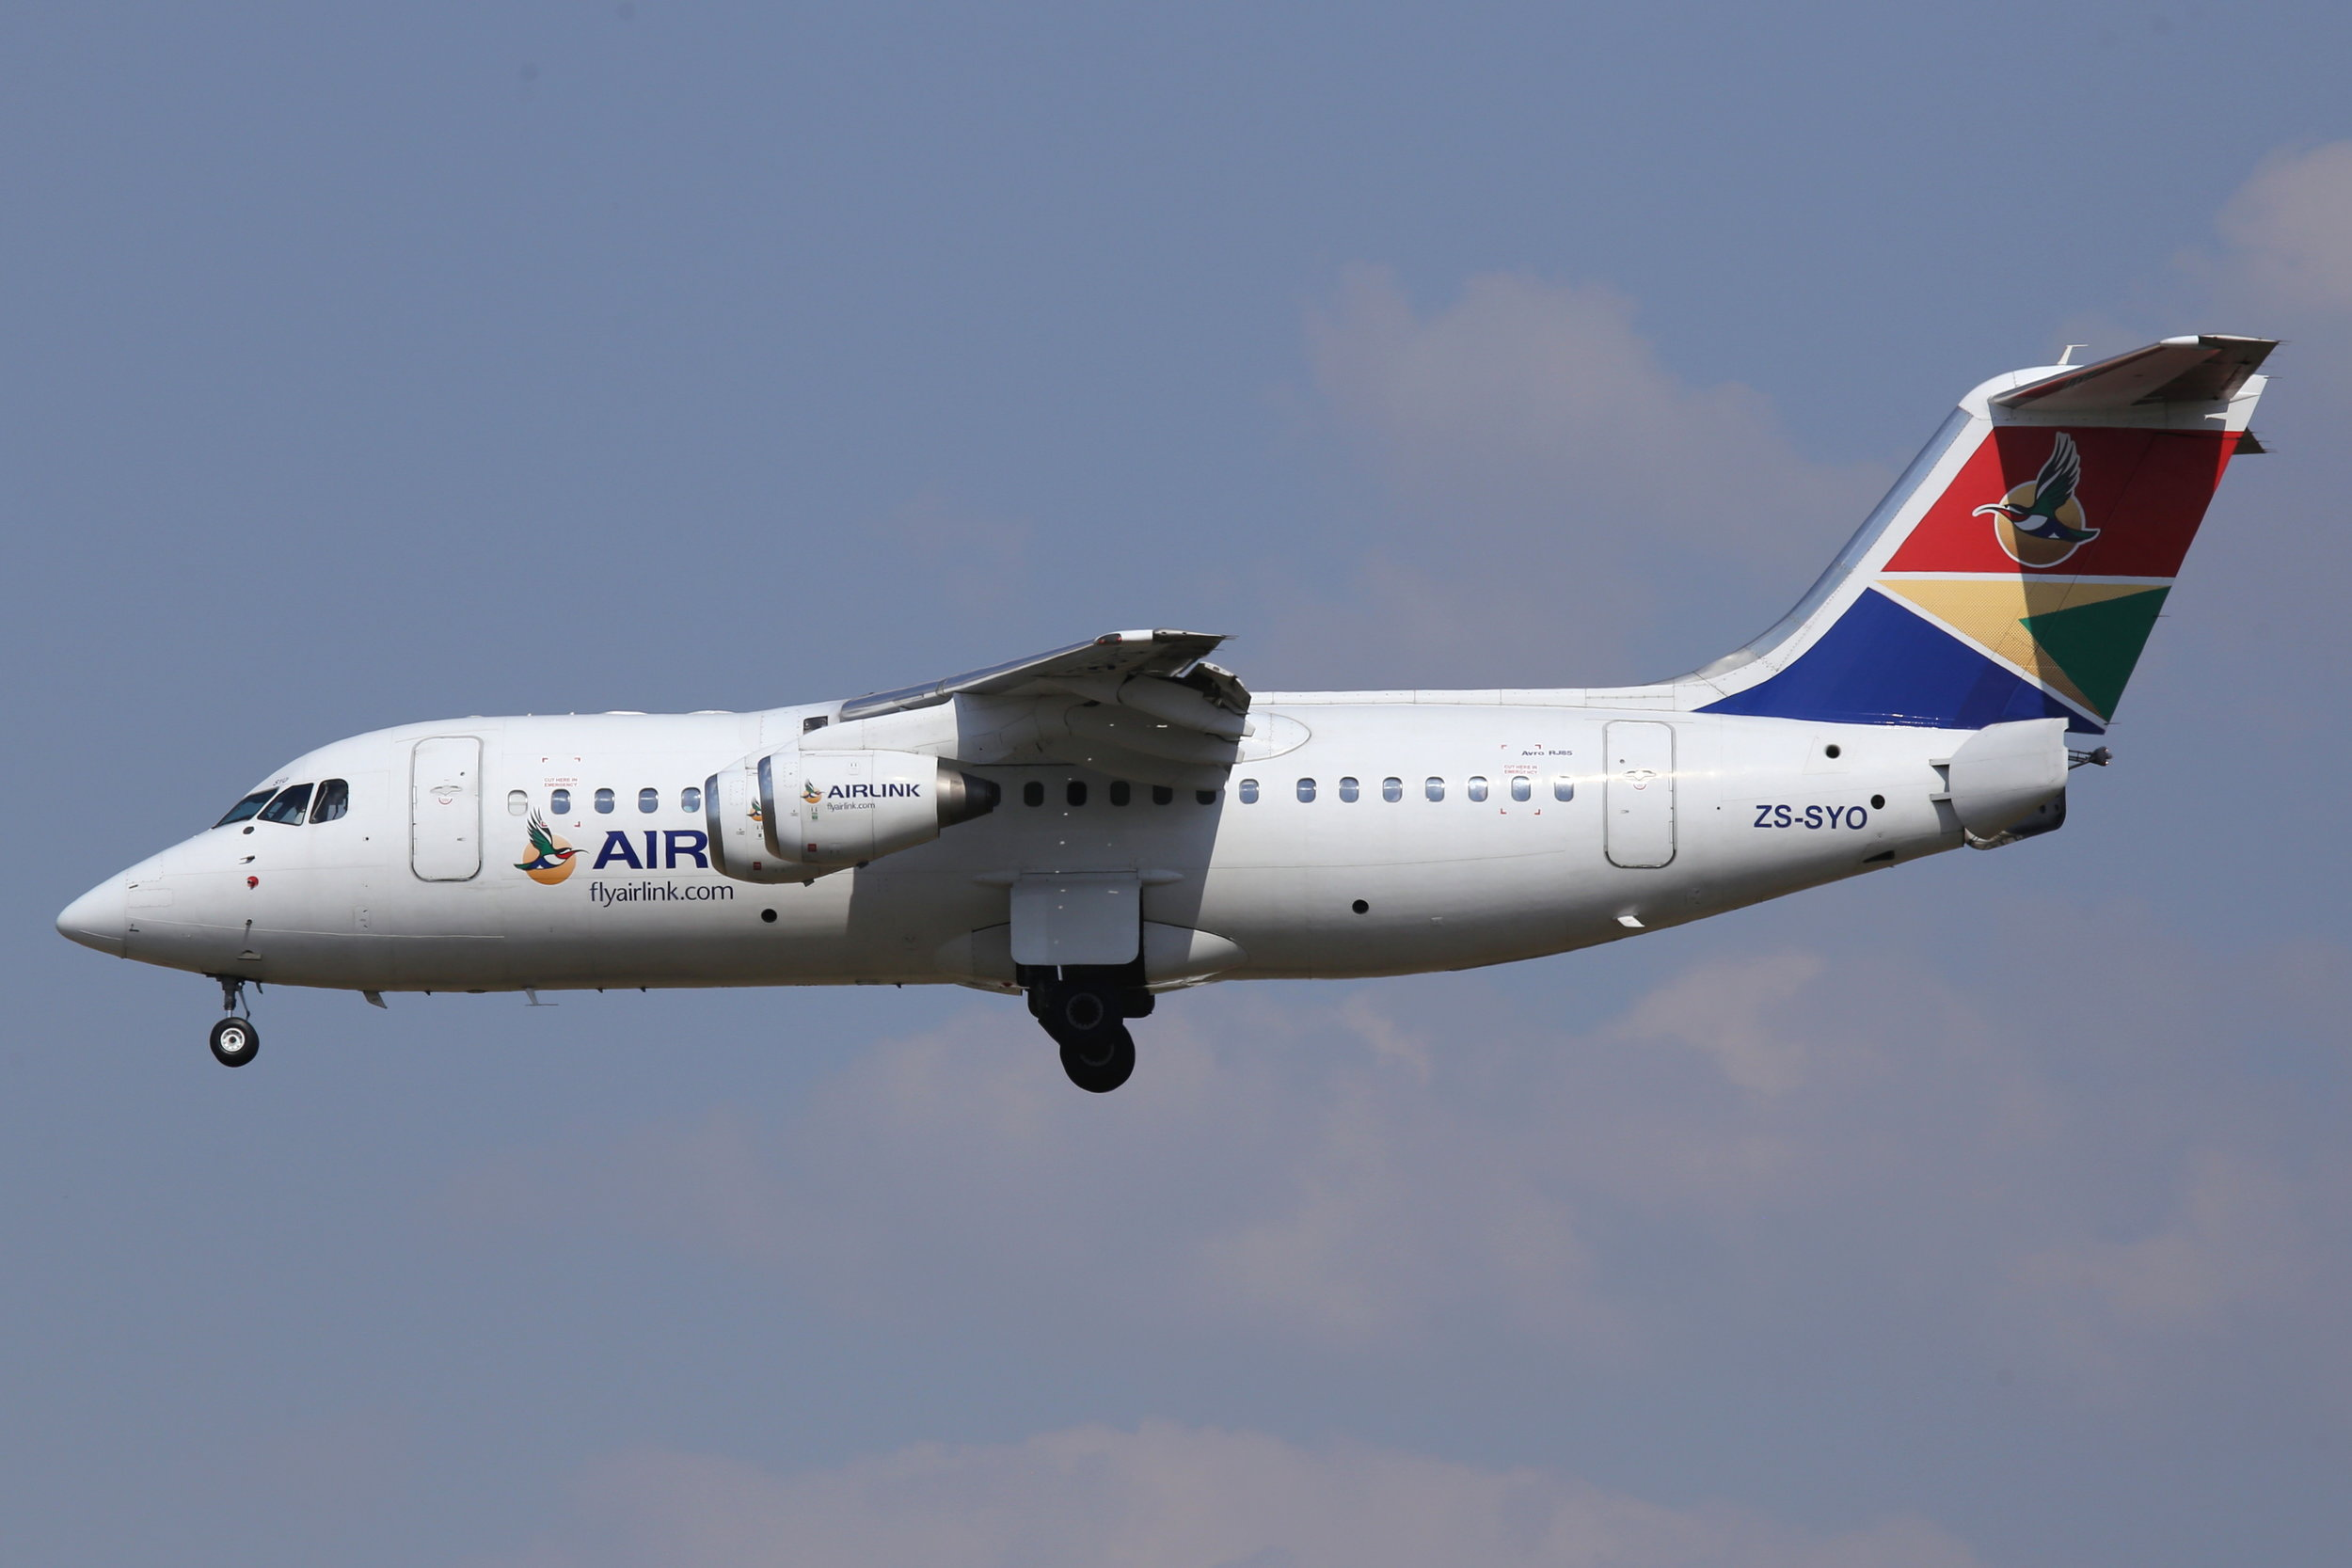 ZS-SYO SAA Airlink BAE 146-RJ85 taken at Johannesburg 10th November 2018 by John Wood